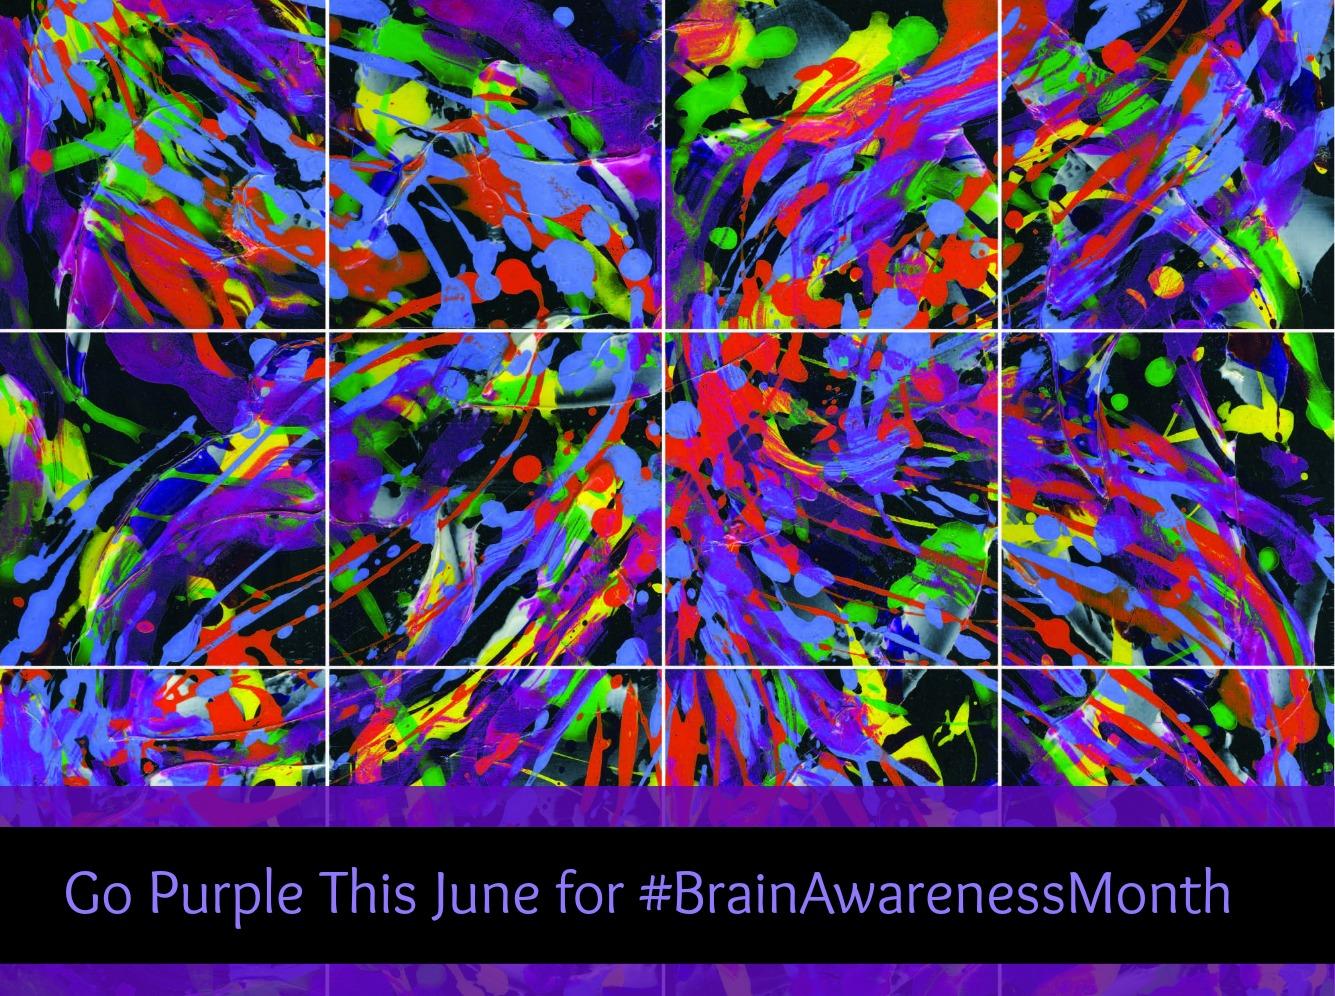 Brain development fetal behavior image 3